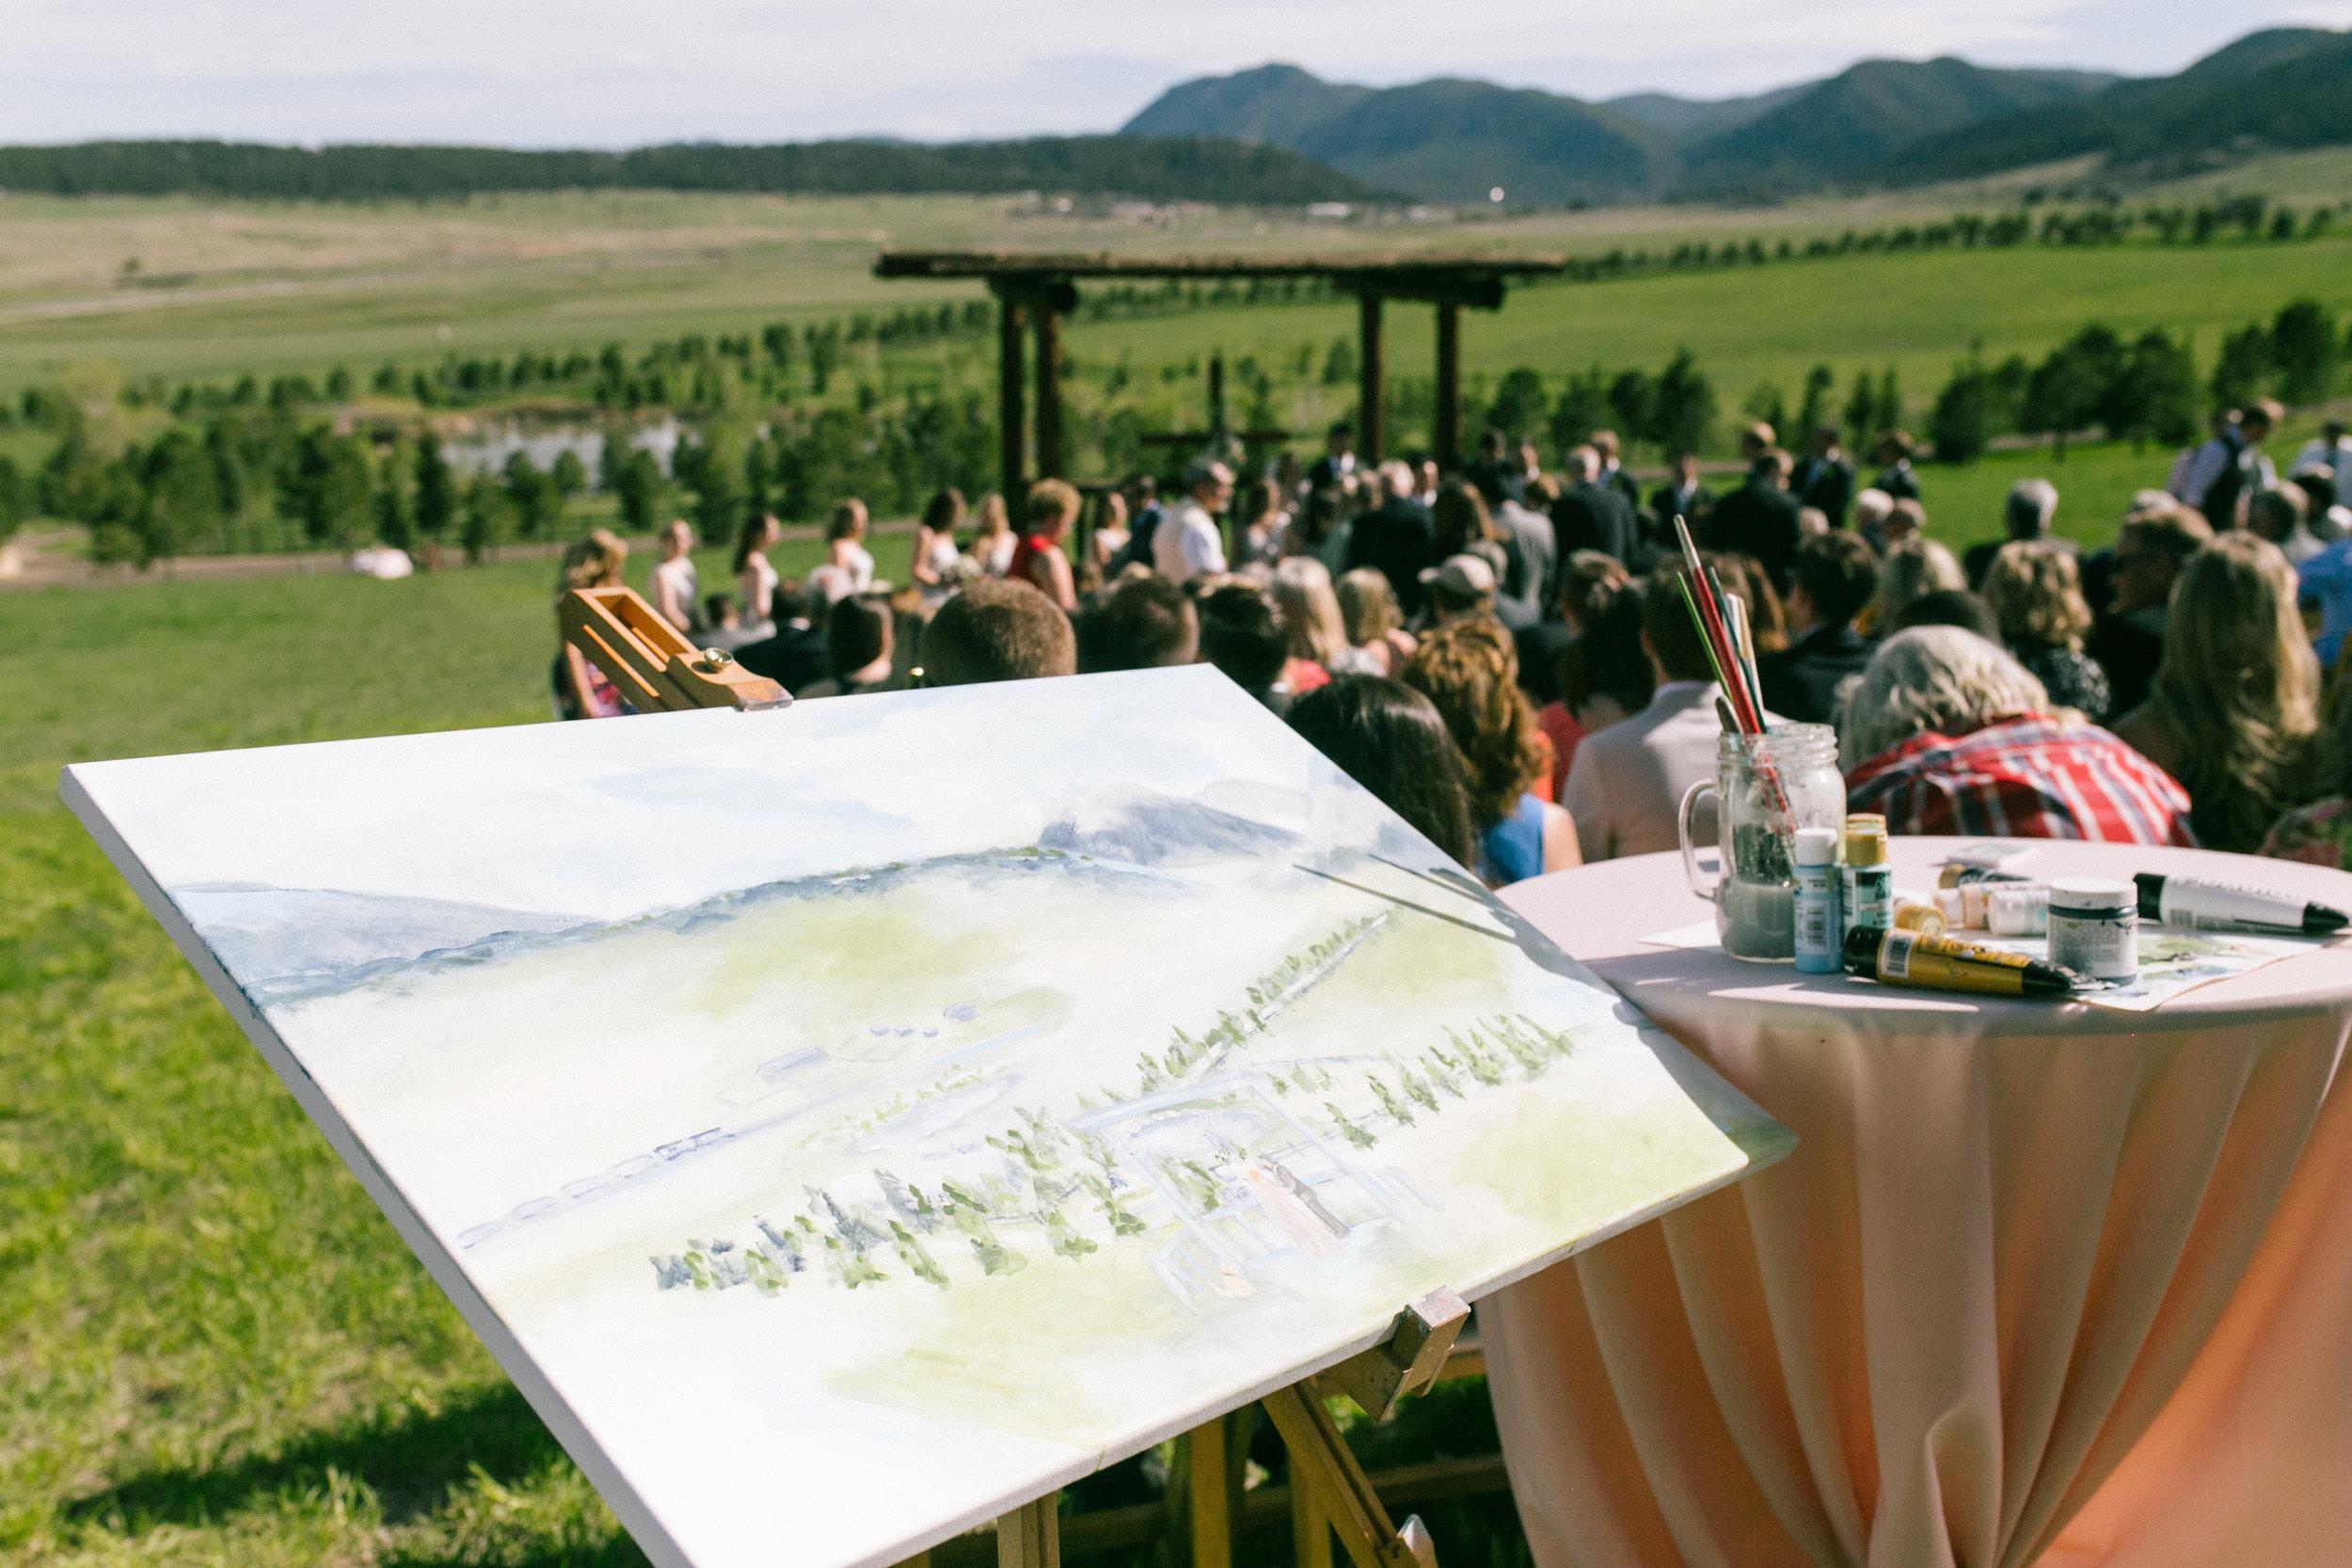 Kyle-Scott-Spruce-Mountain-wedding-by-Lisa-O'Dwyer-553.jpg